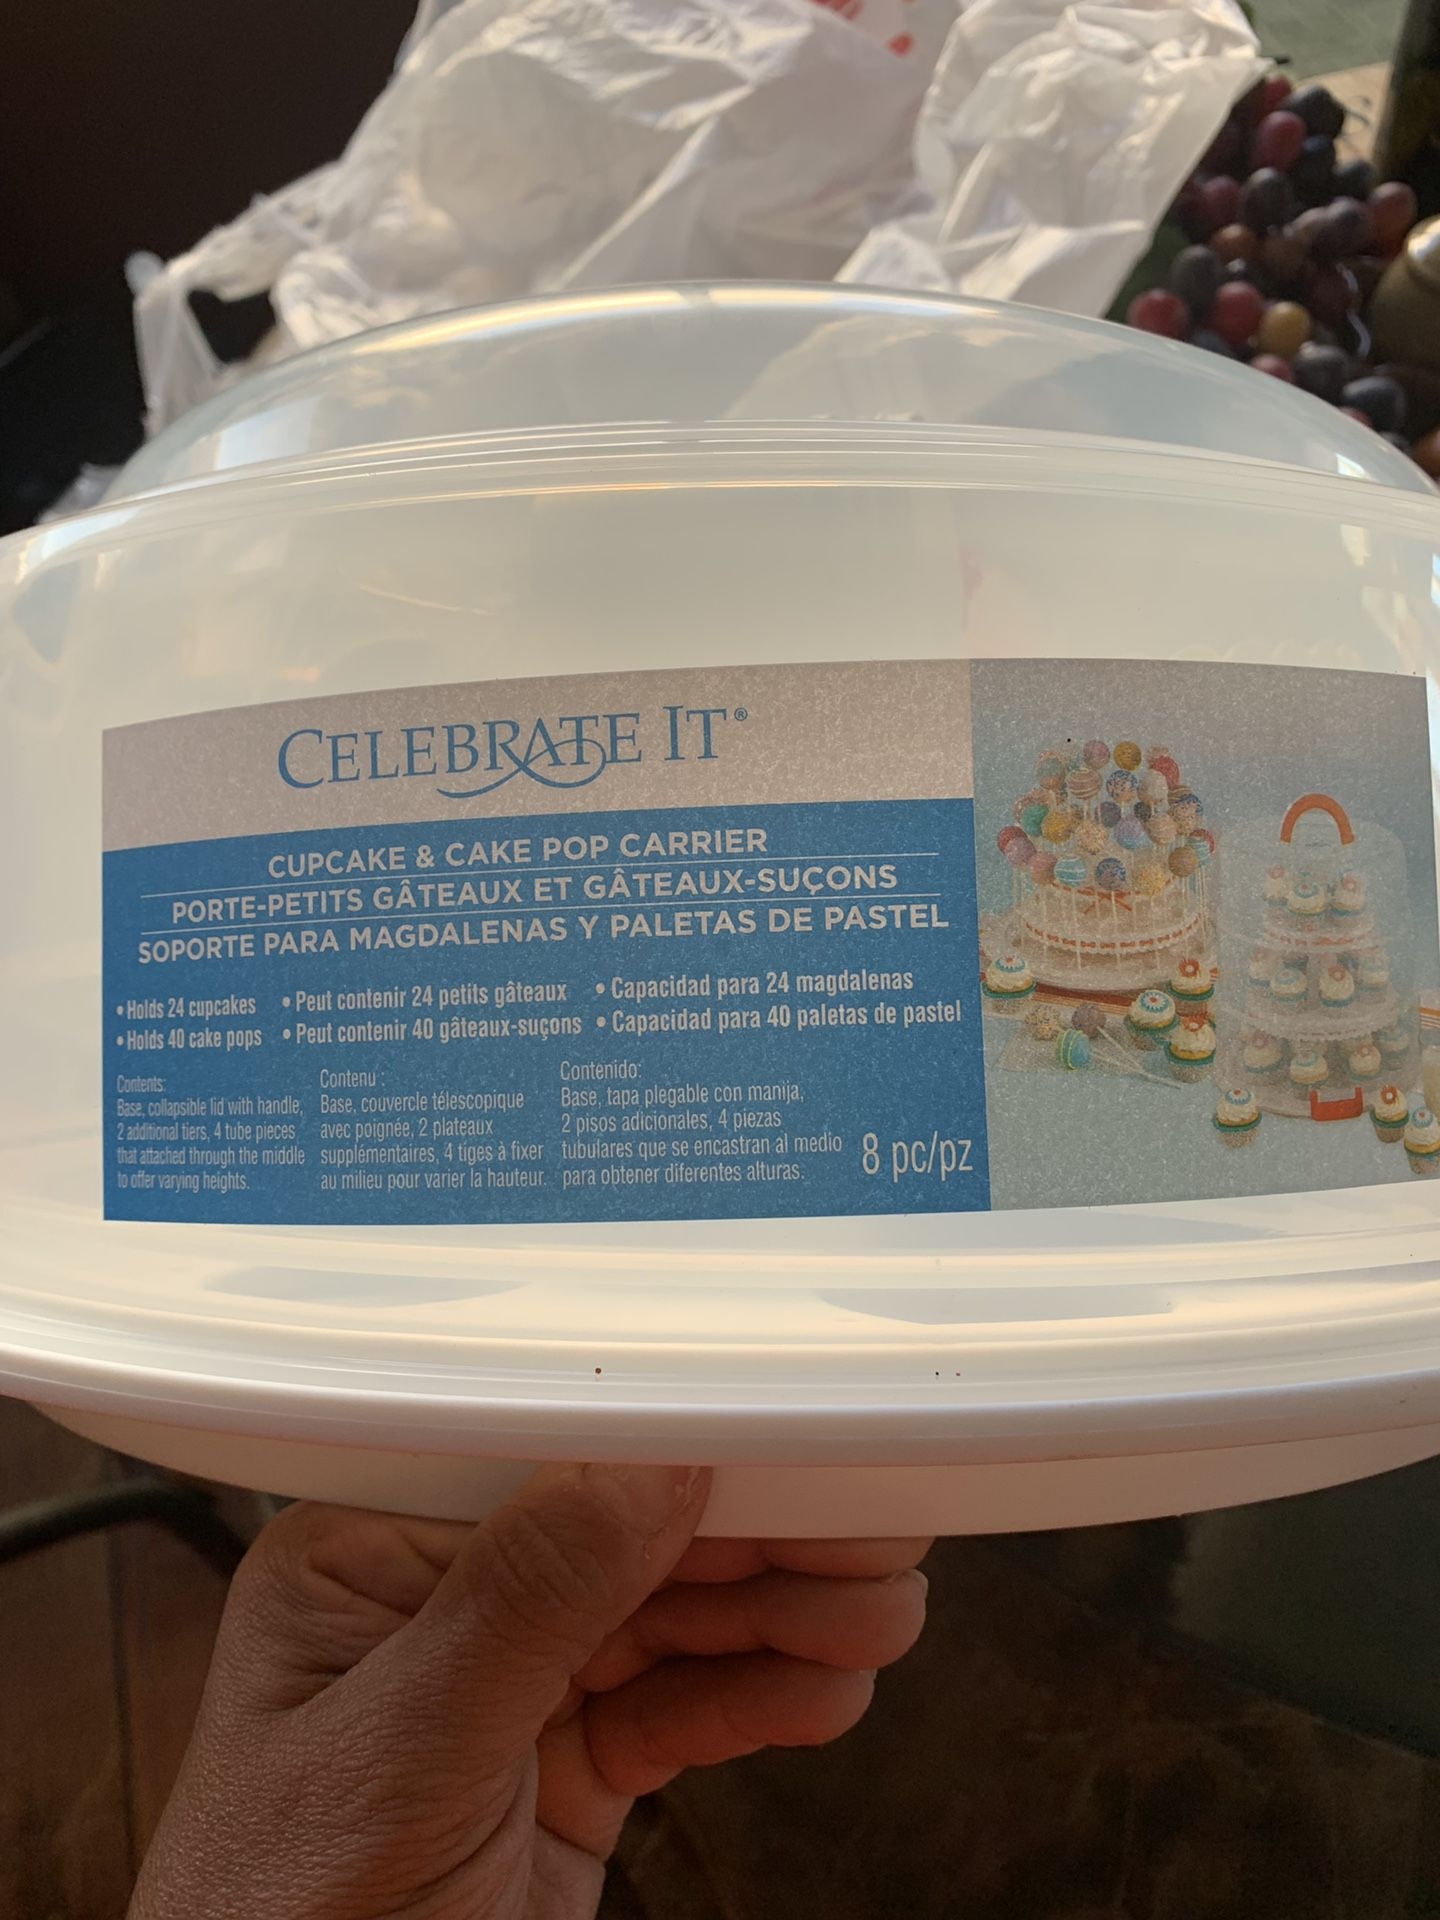 Celebrate It® Cupcake & Cake Pop Carrier